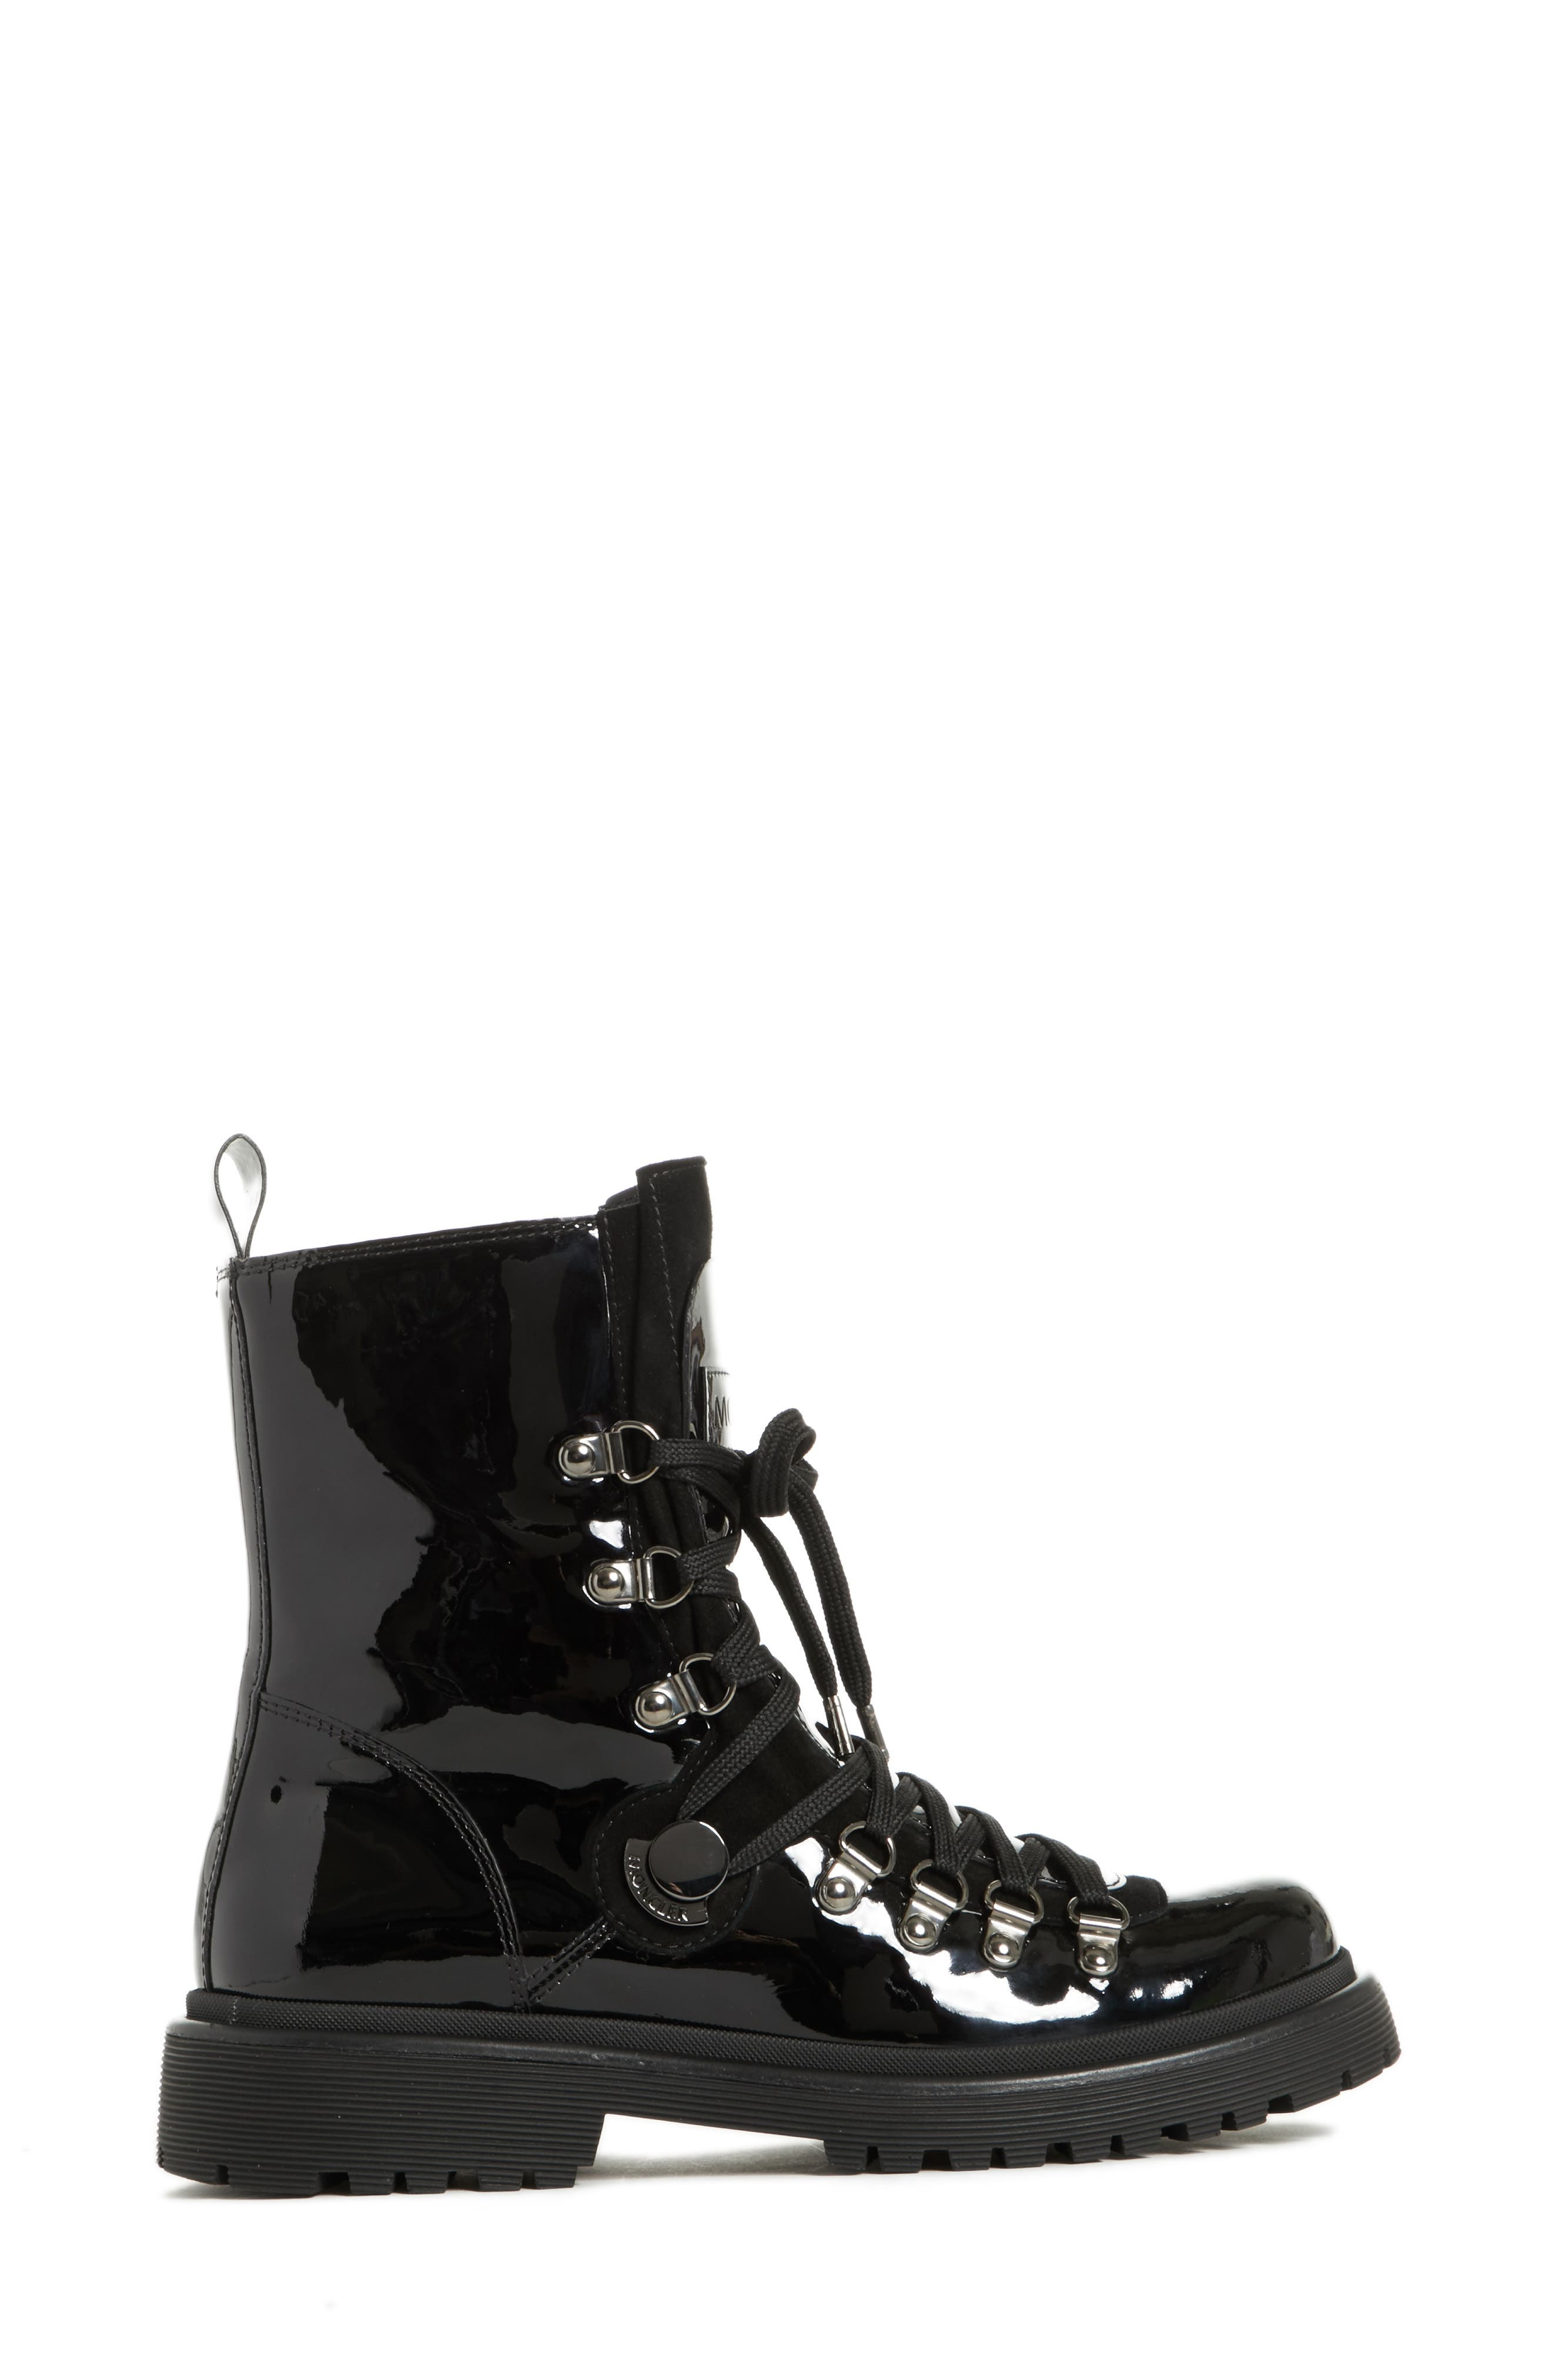 MONCLER, Berenice Stivale Lace-Up Boot, Alternate thumbnail 3, color, BLACK PATENT